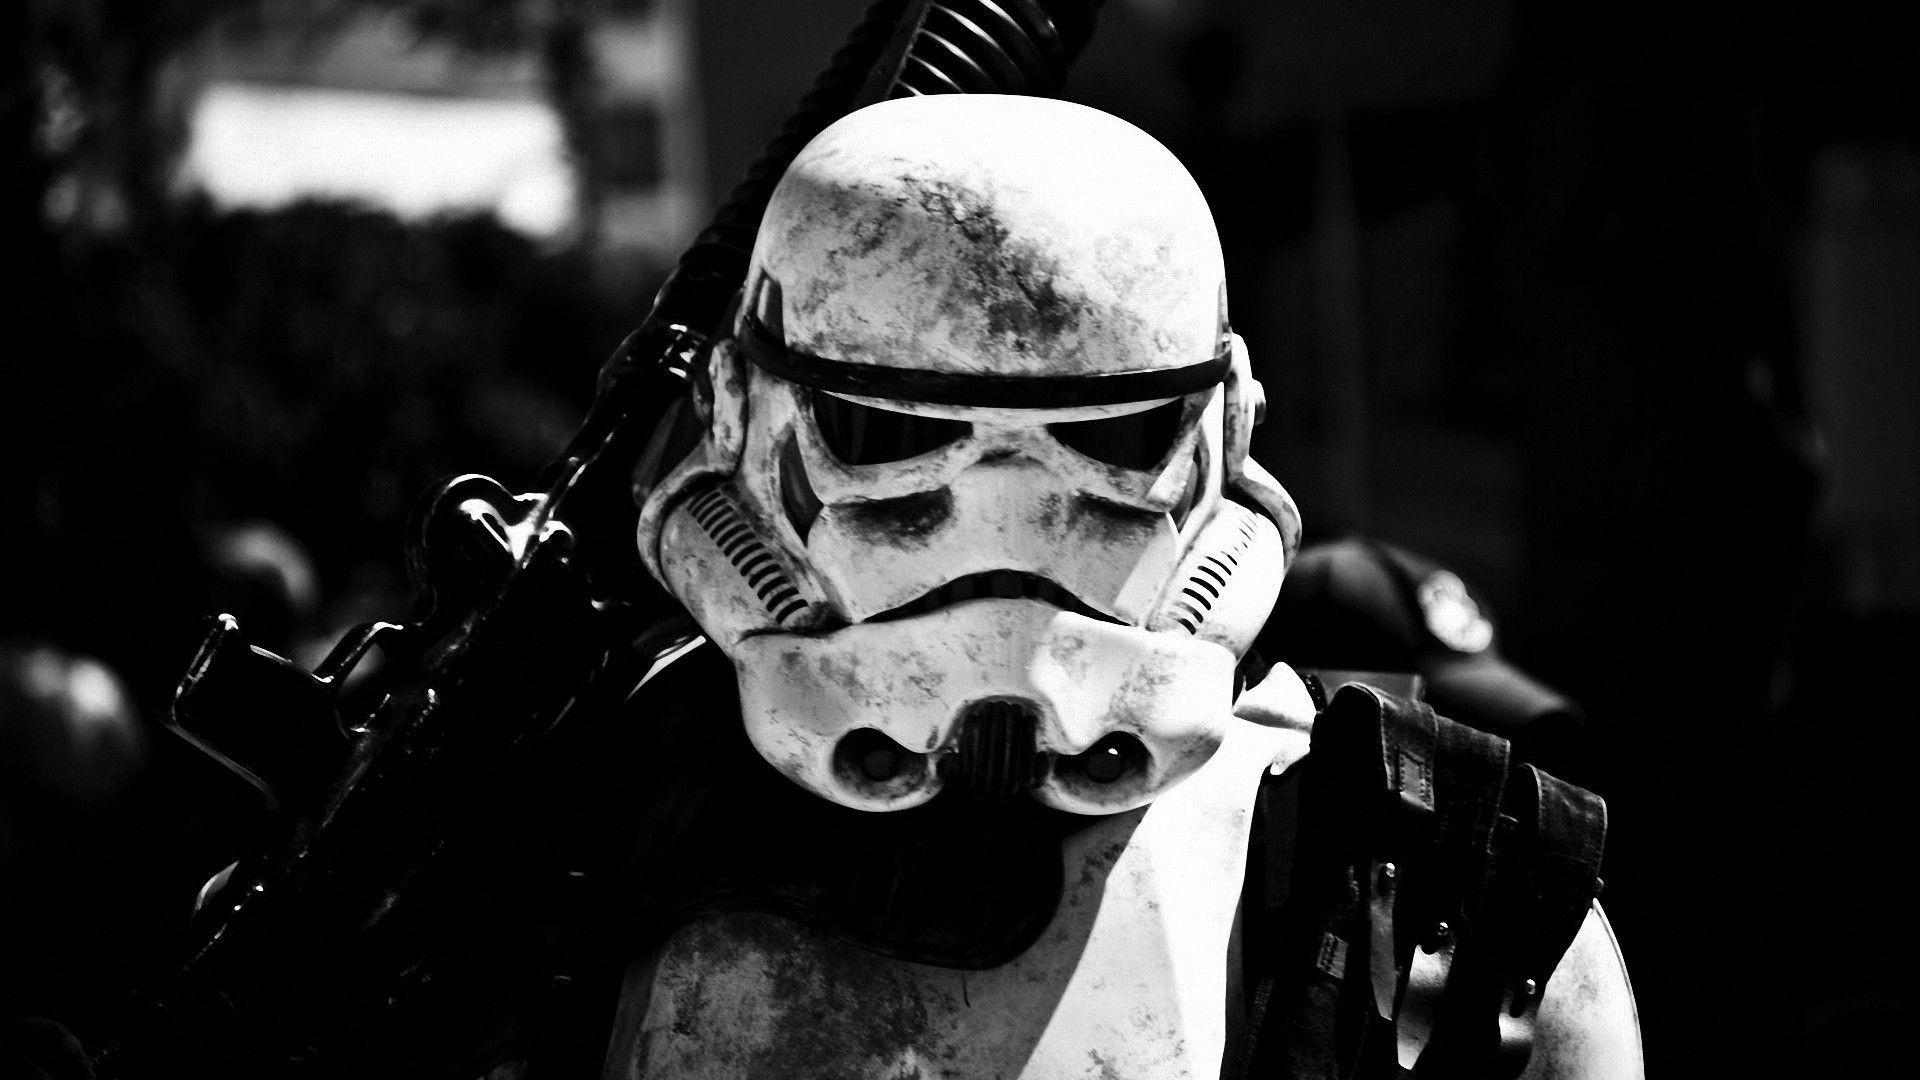 HD Wallpapers Star Wars (29 Wallpapers)